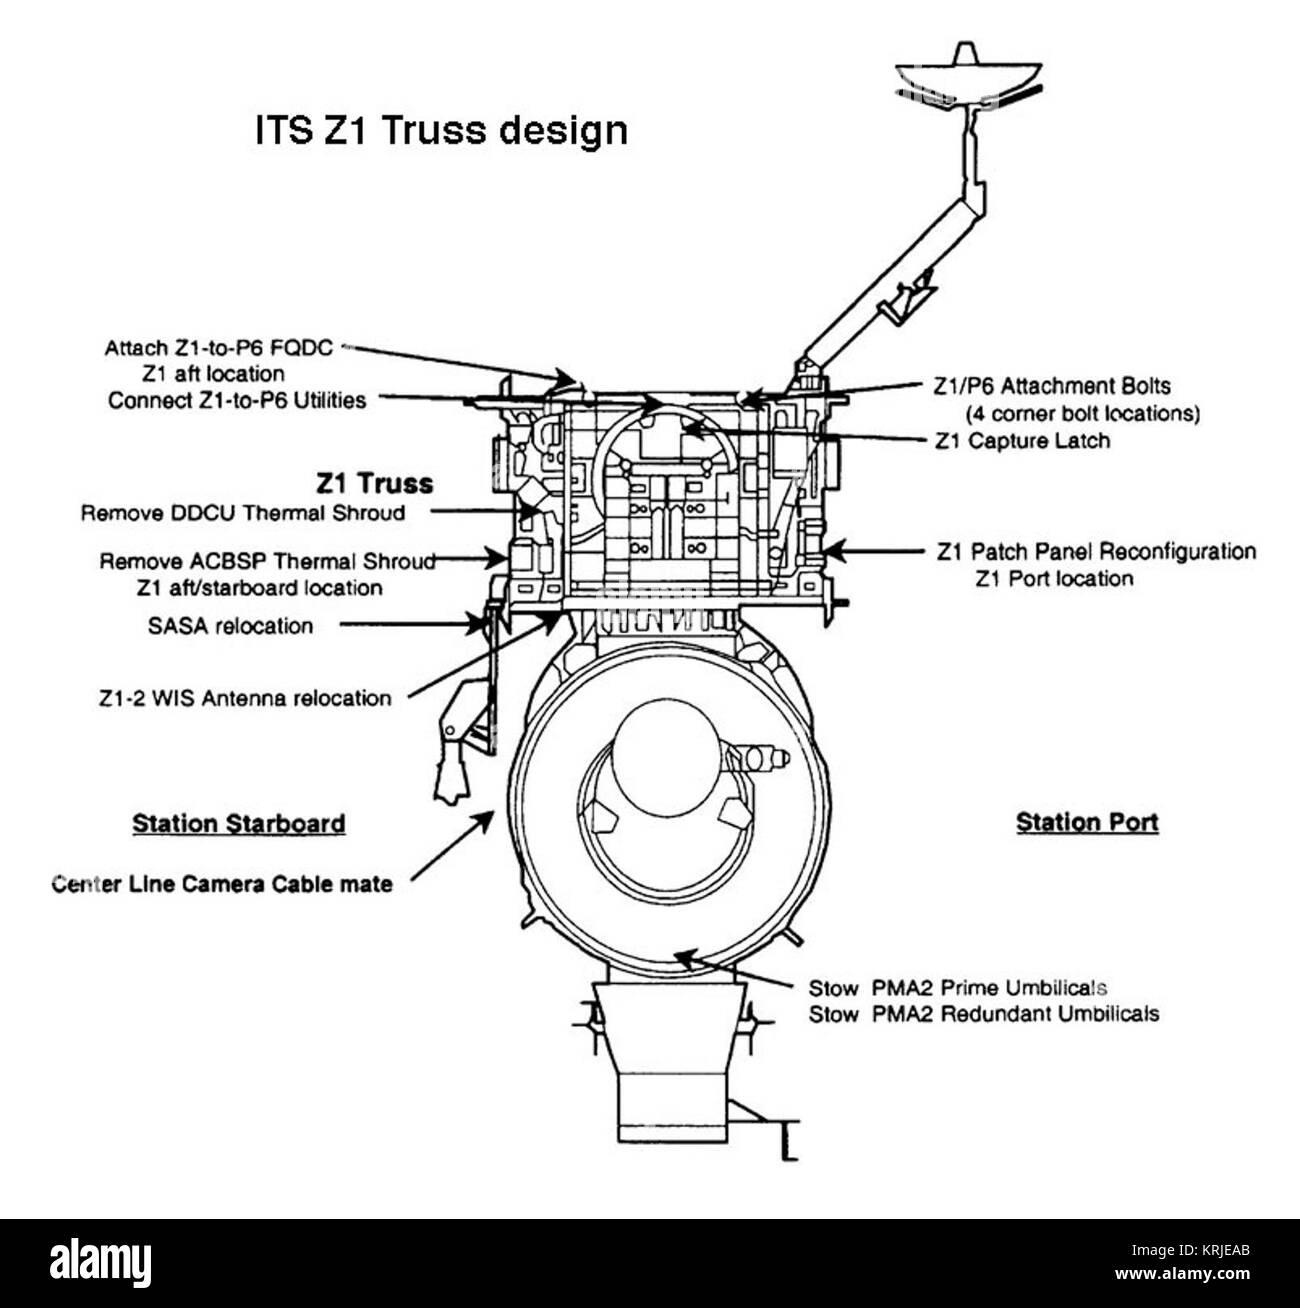 Z1 Stock Photos Images Alamy 900 Engine Diagram 01a Truss Image